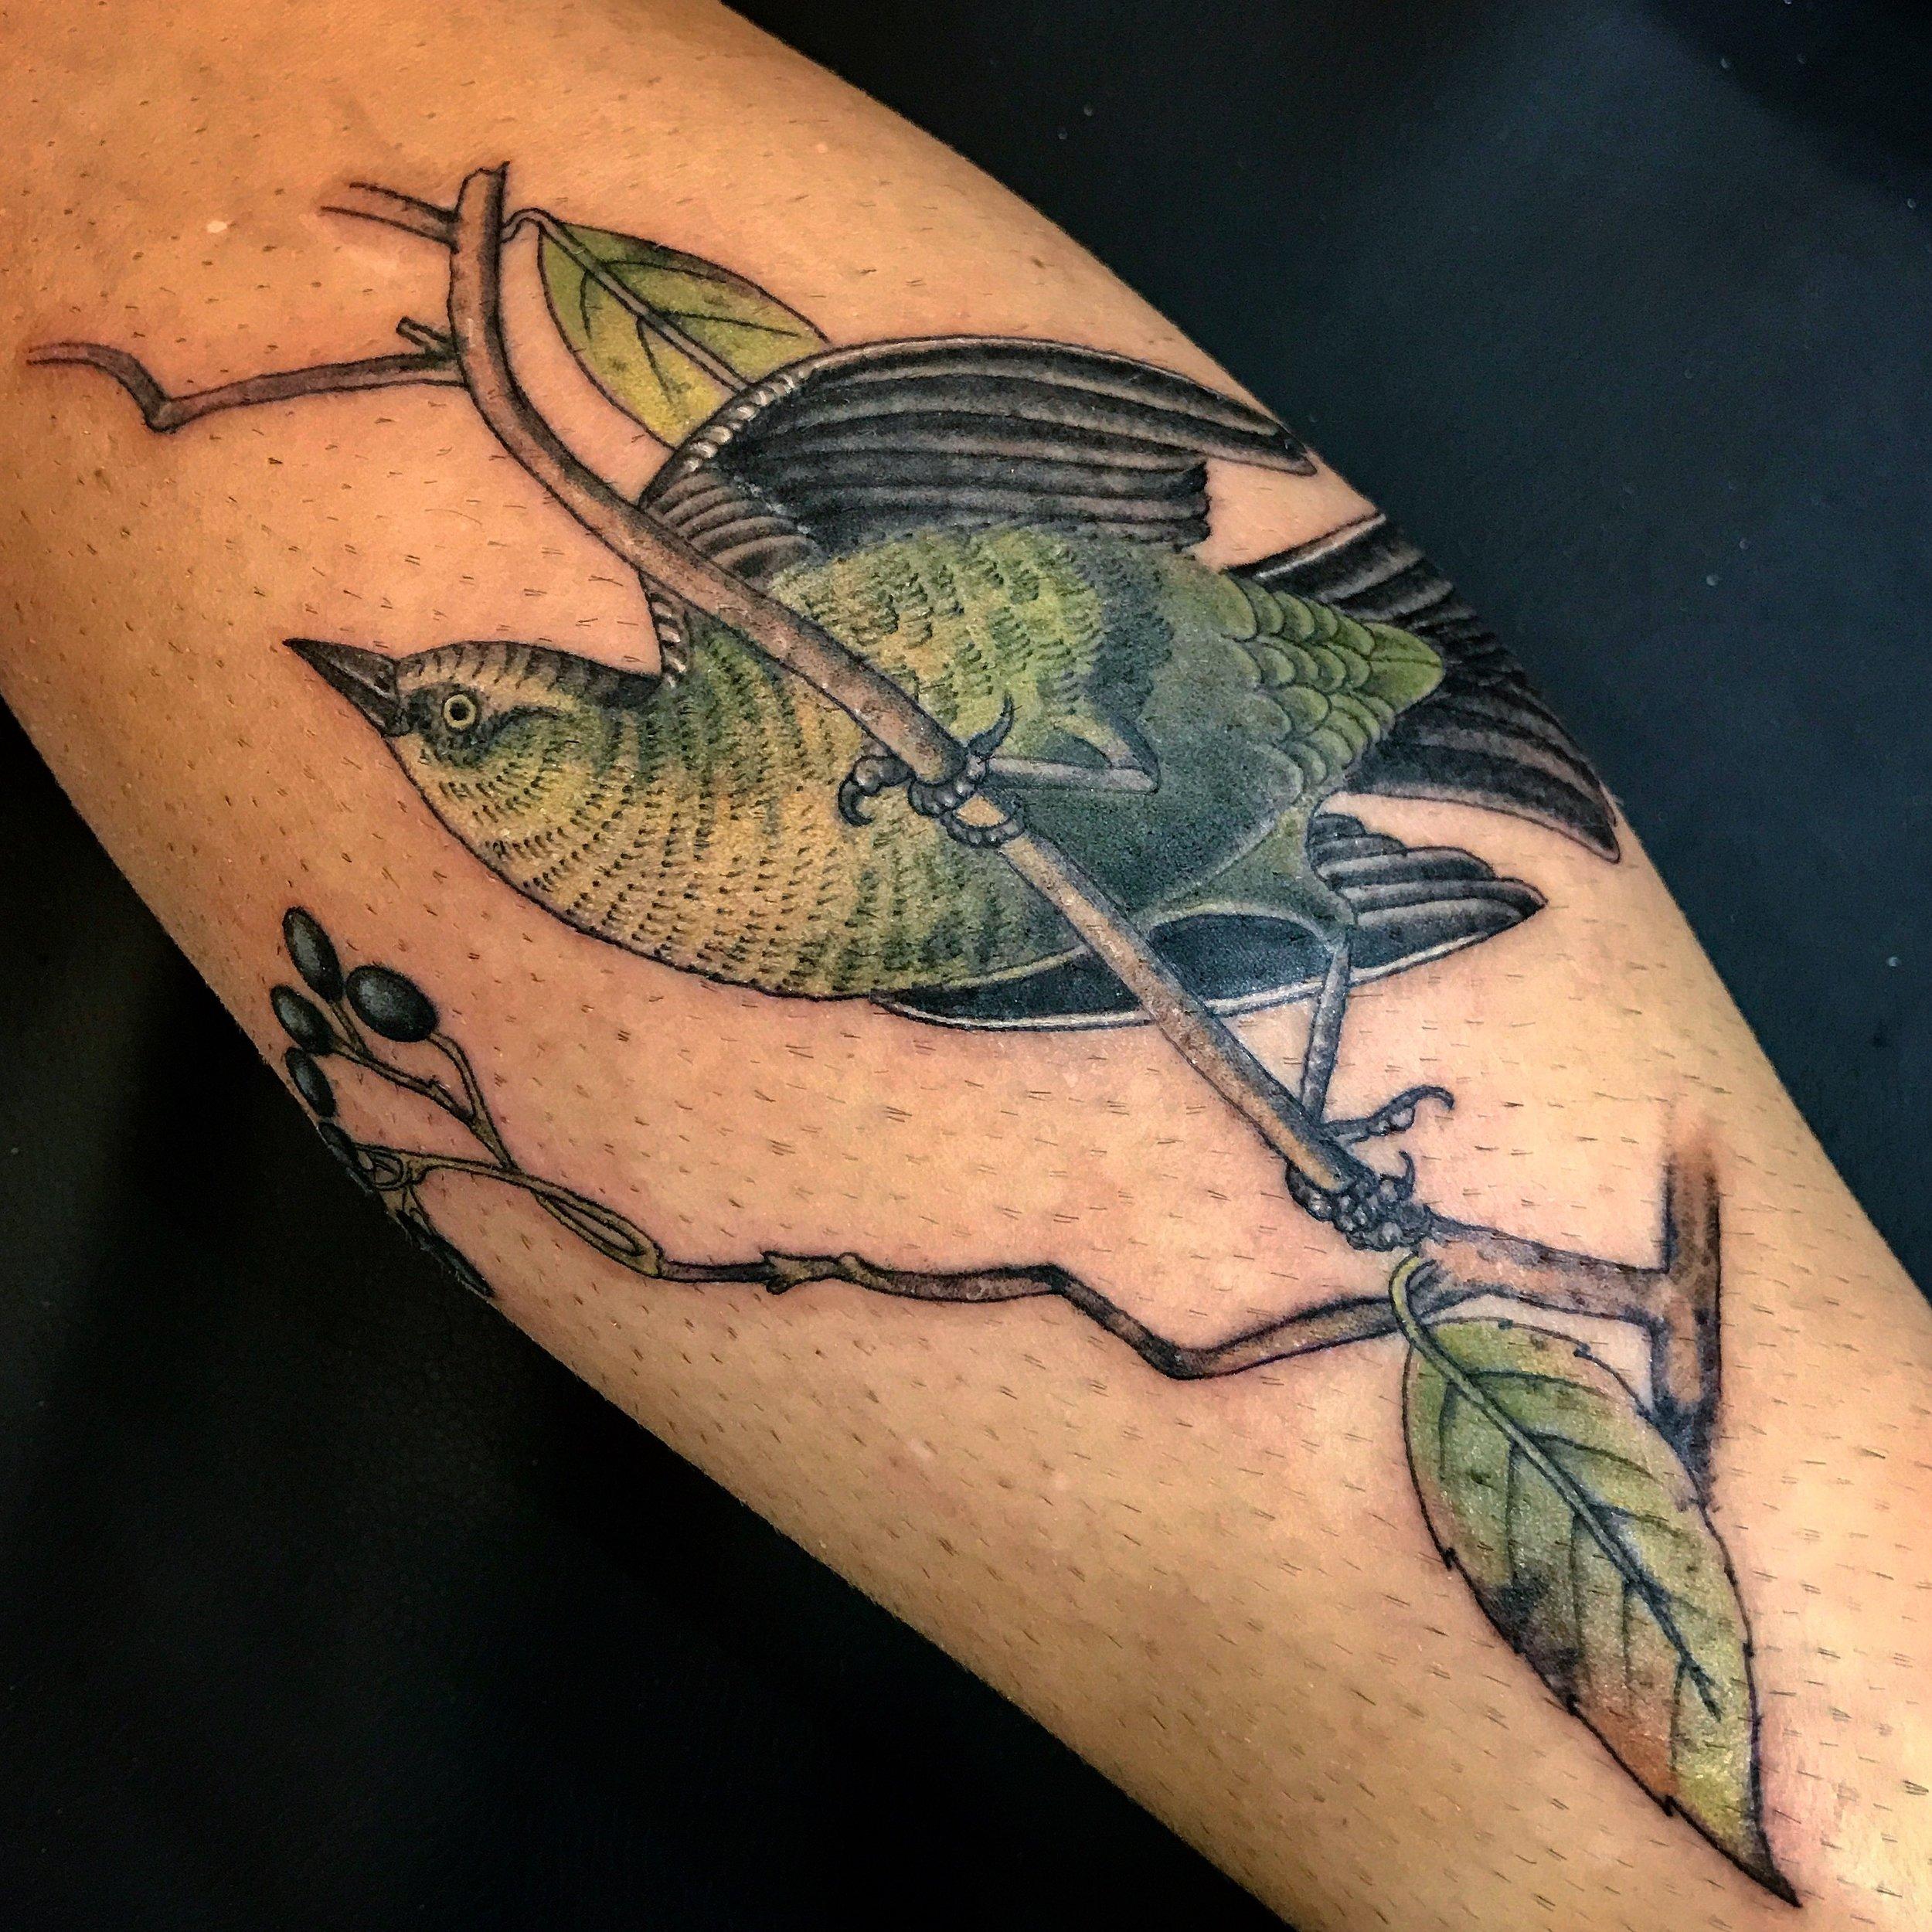 Gustavo Rierio tattoo 10.JPG